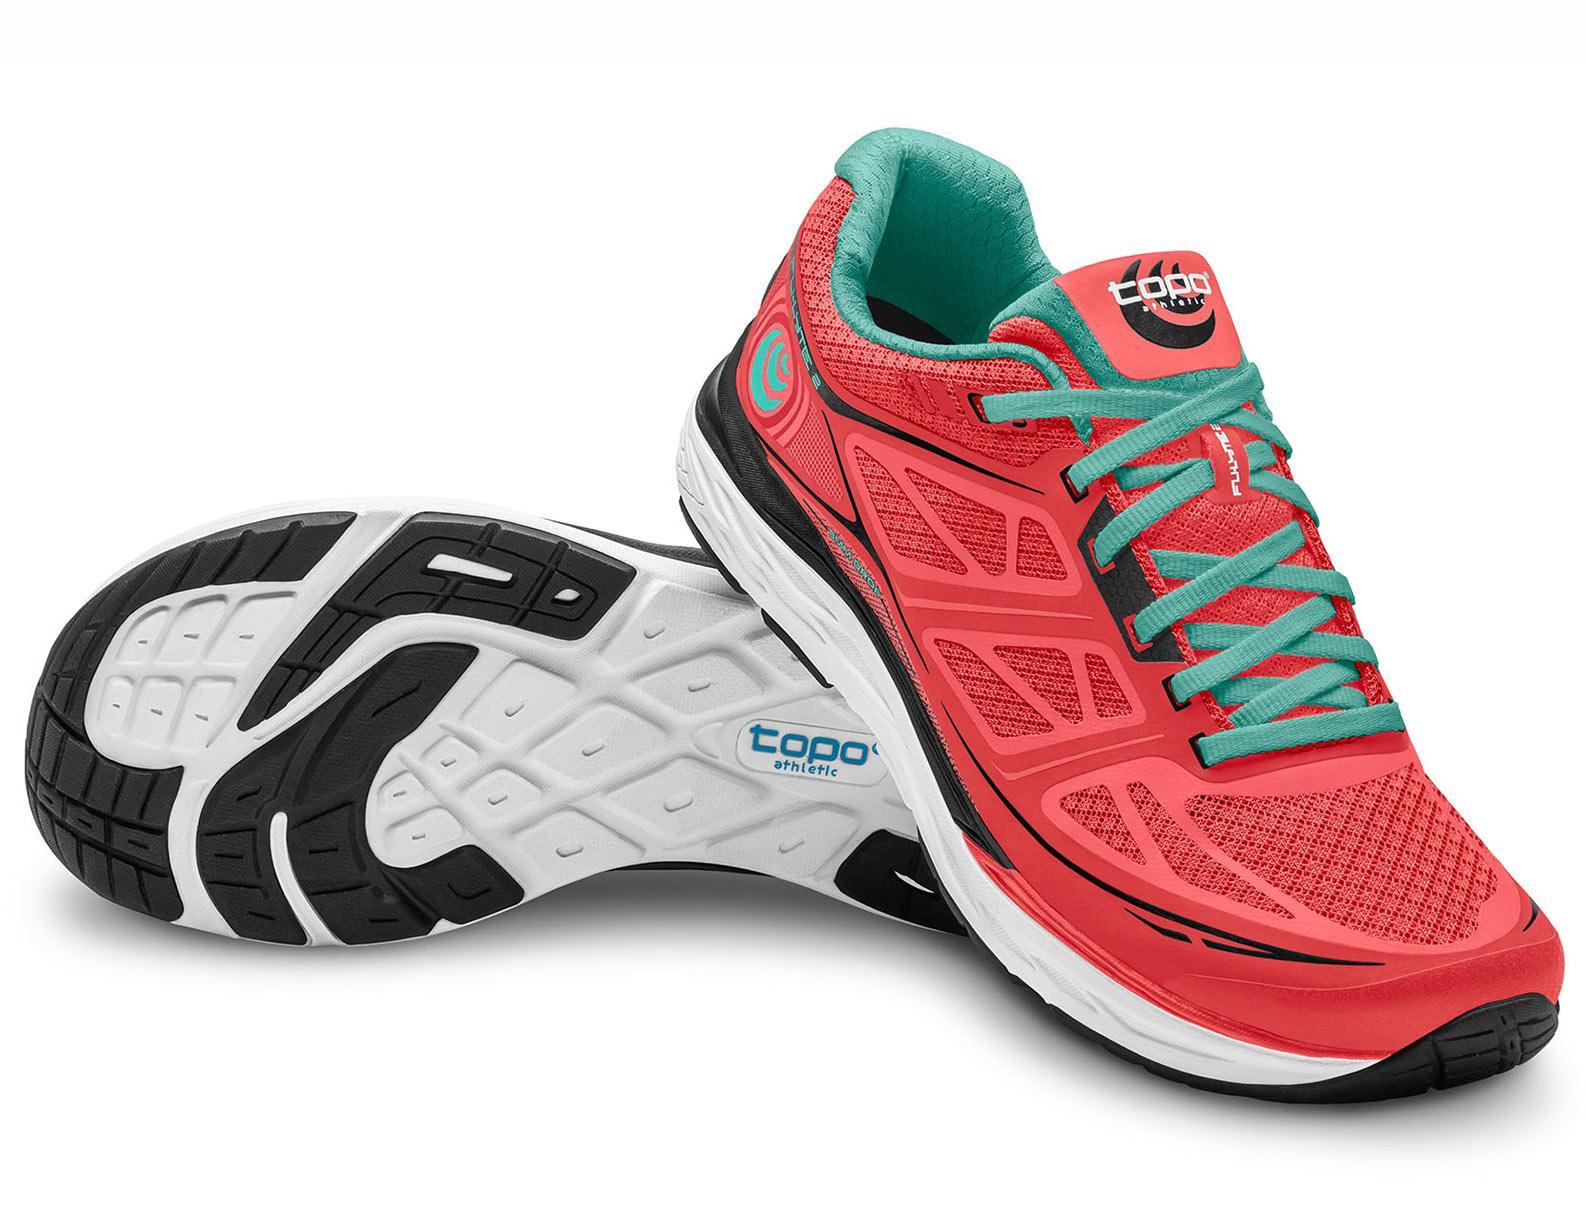 TOPO Fli-lyte 2 - běžecké boty silniční 2ba5da2cbb